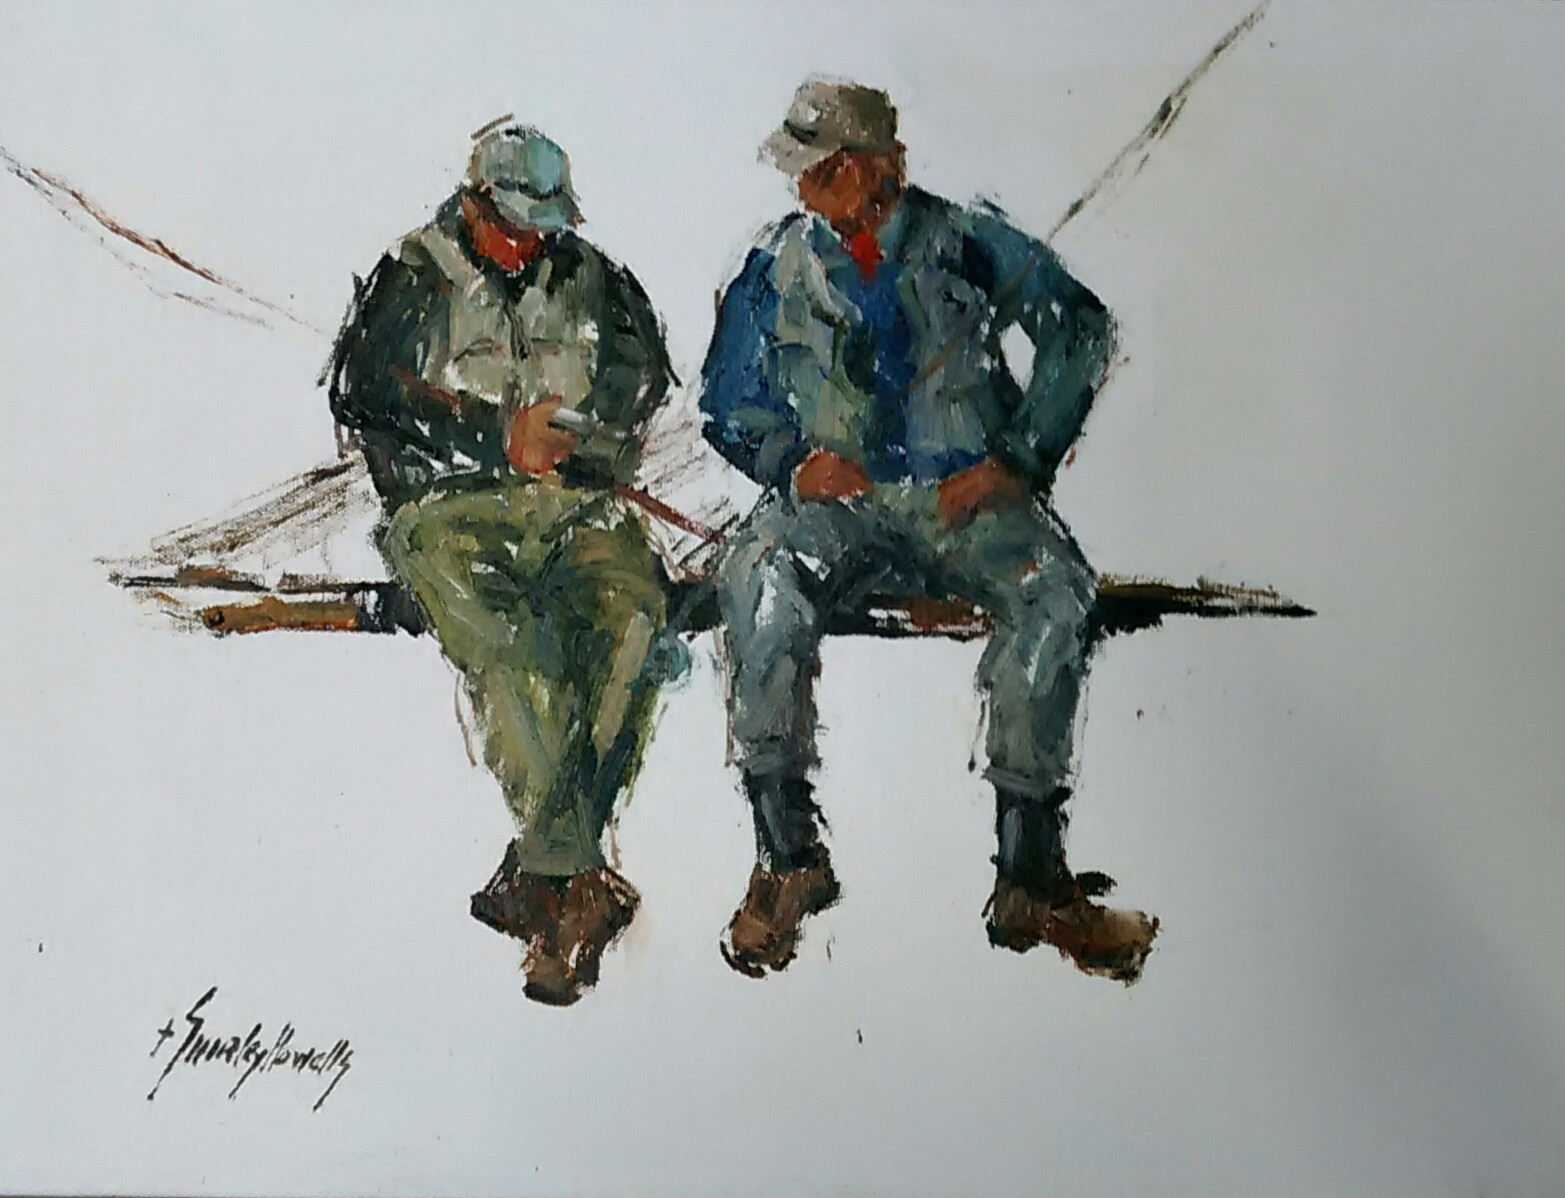 Shirley Howells. Artist